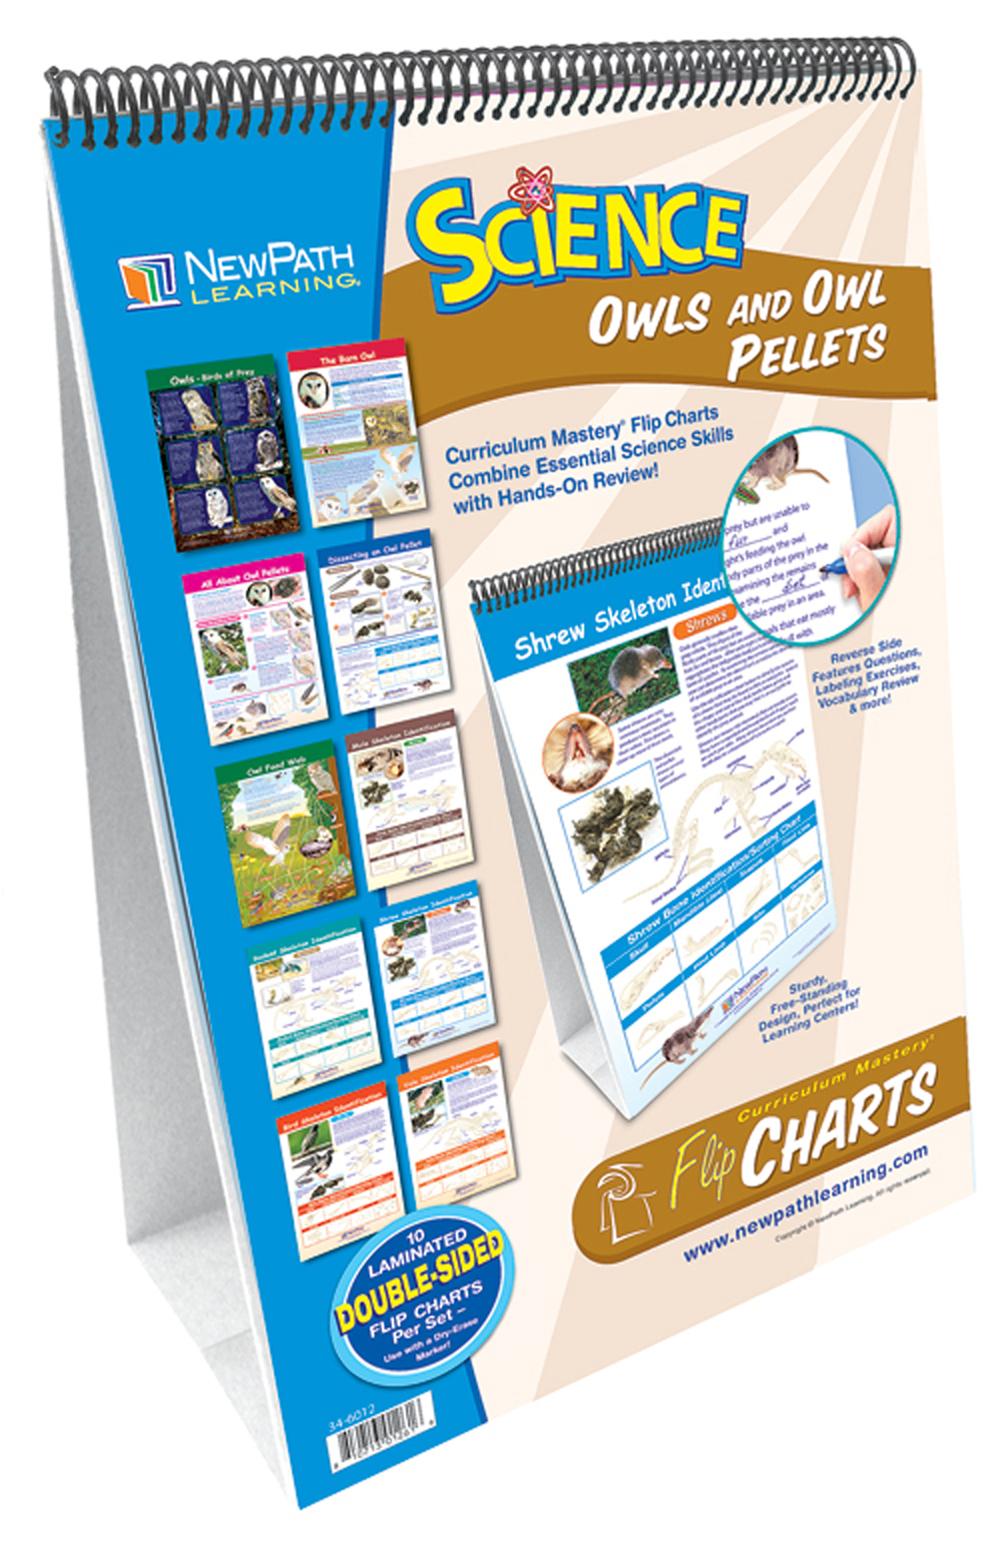 Owls and Owl Pellets Curriculum Mastery Flip Chart®